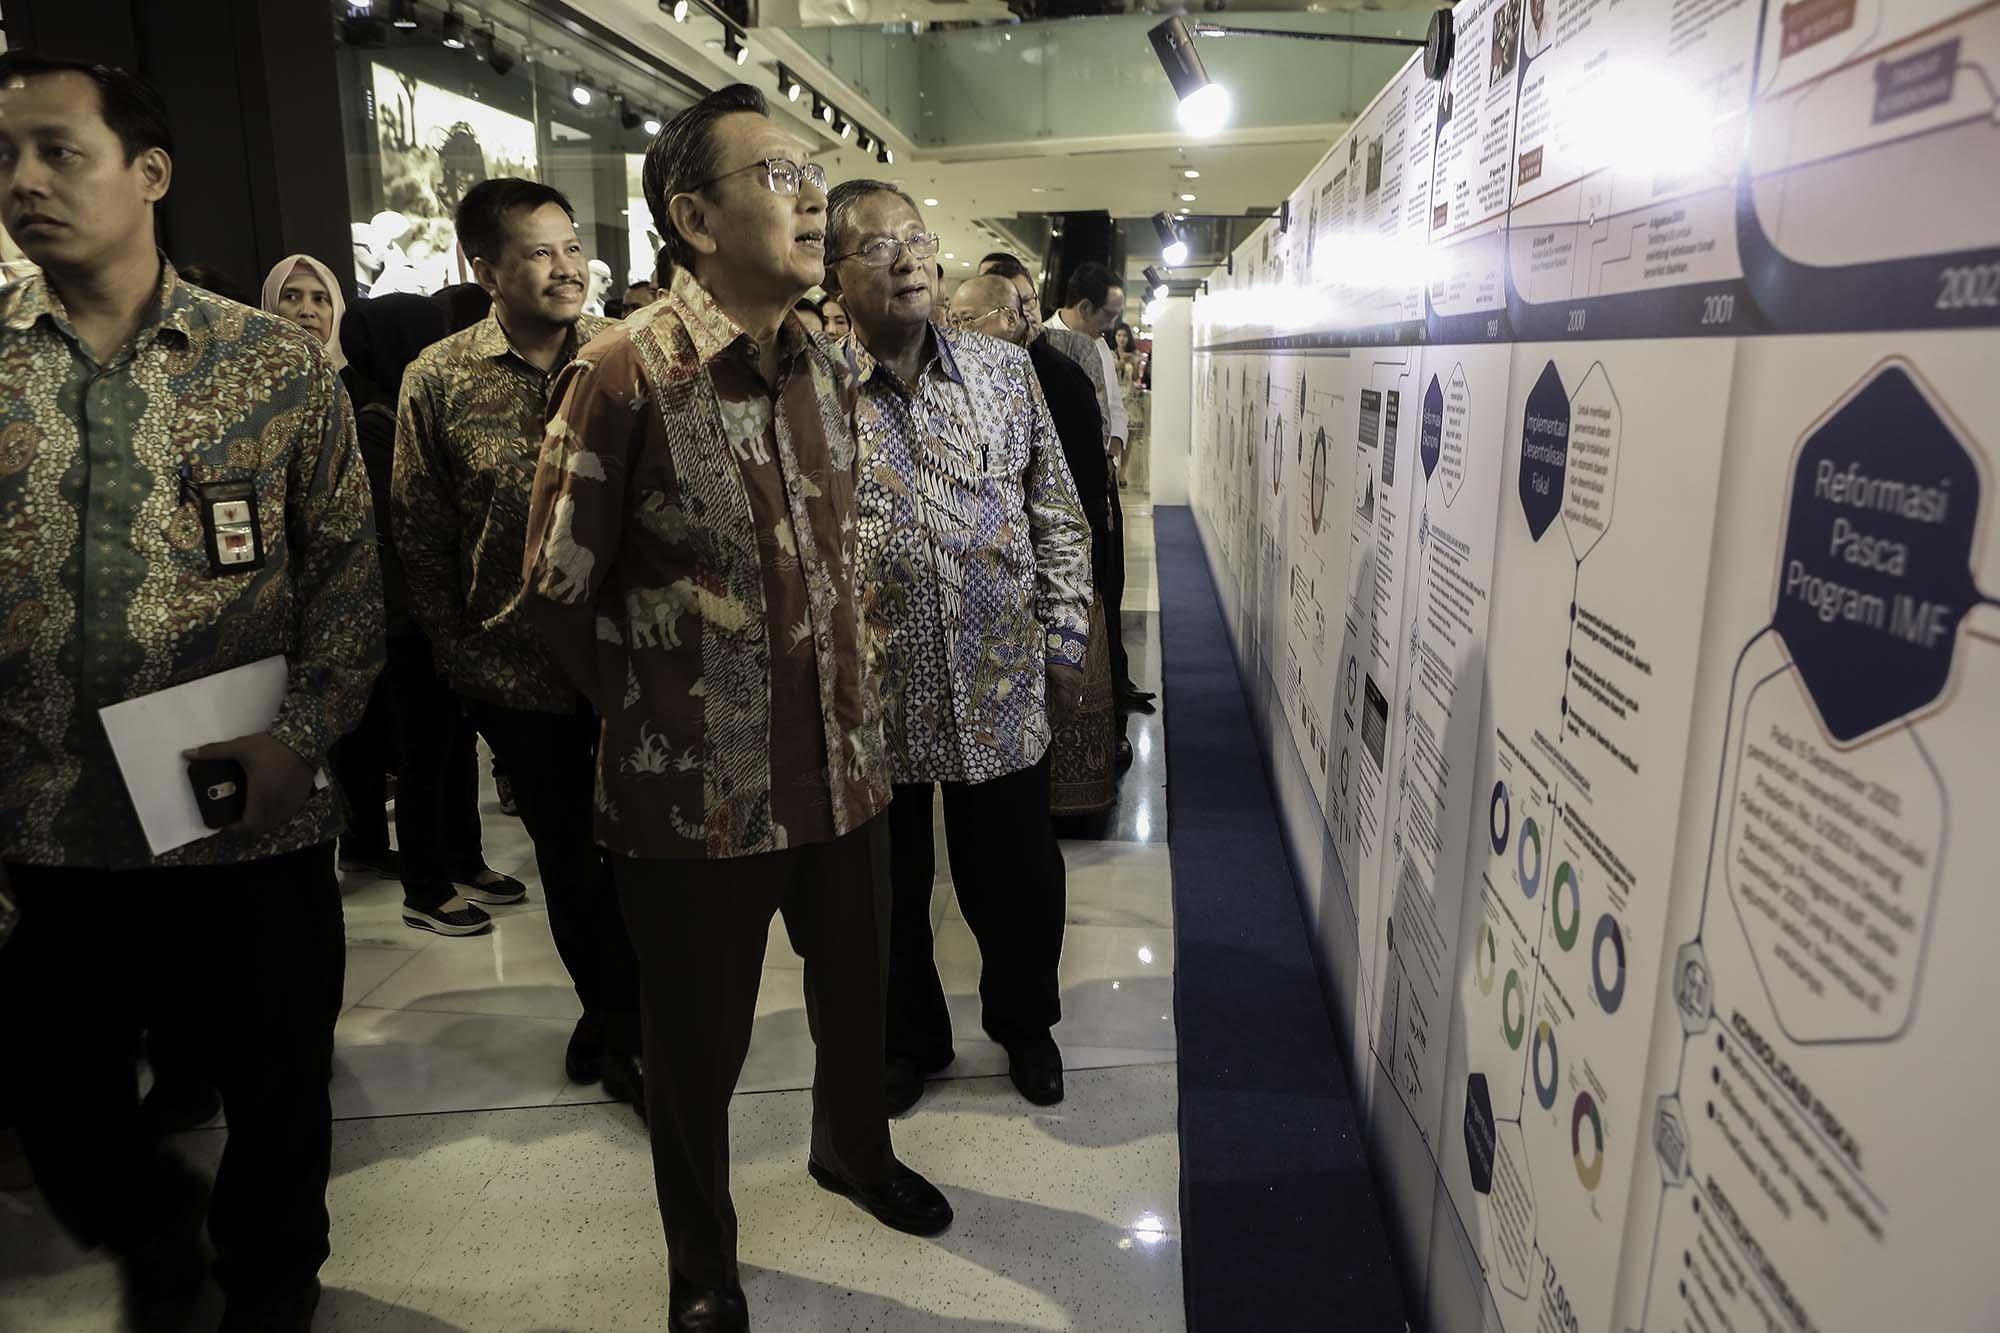 Boediono (Wakil Presiden RI 2009-2014) dan Menteri Koordinator Bidang Perekonomian Darmin Nasutionmenyaksikn pameran infografik raksasa \